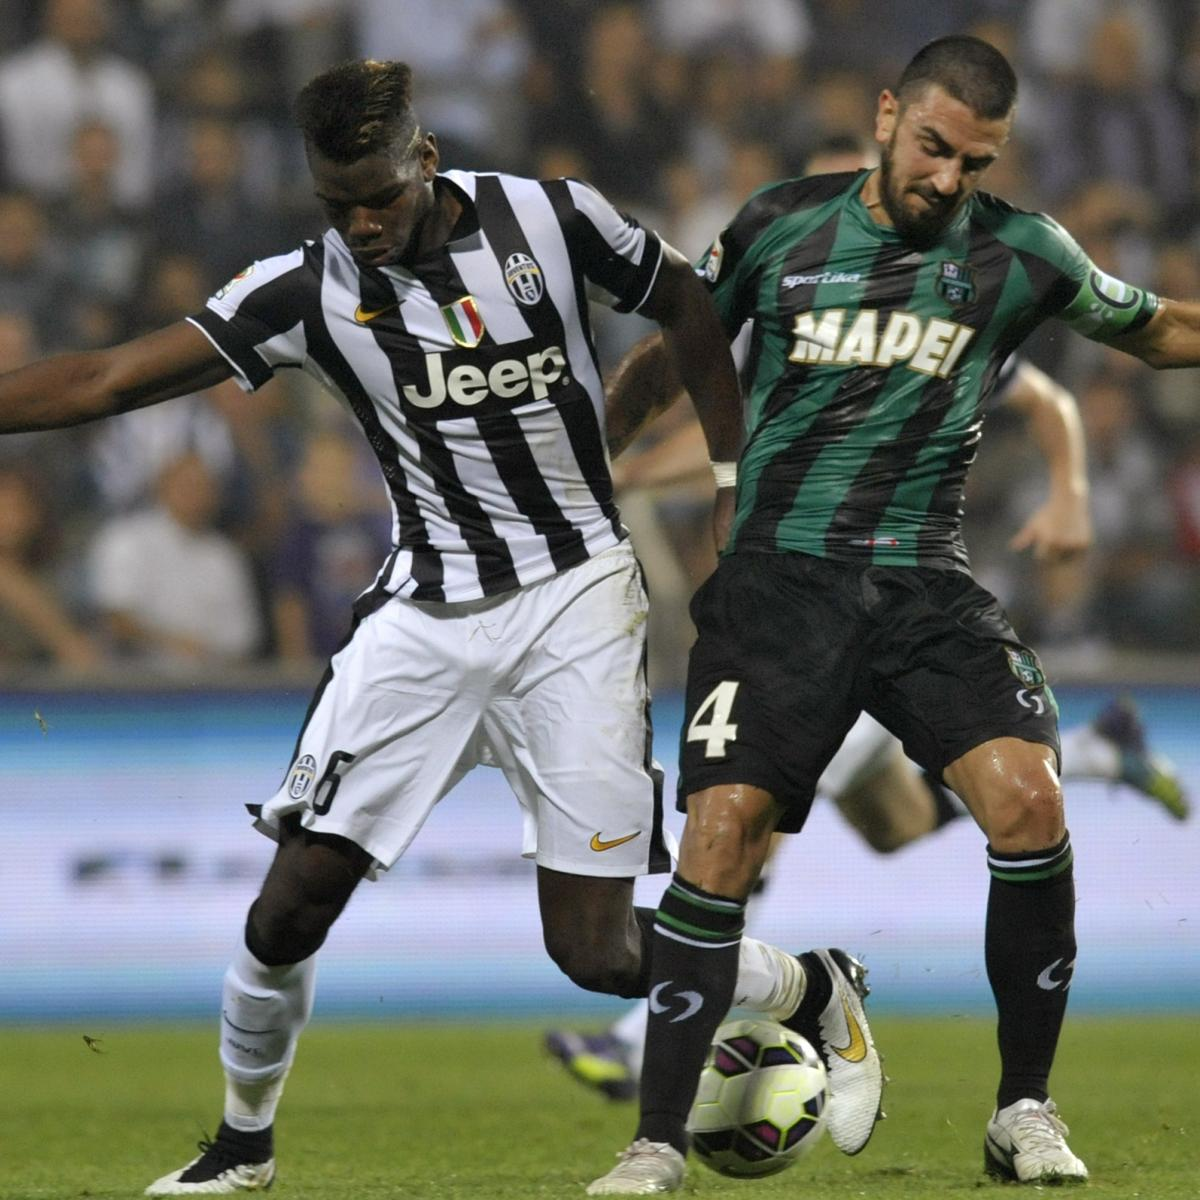 Sassuolo-Juventus 0-2 finale| In Higuain e Khedira |Sassuolo- Juventus